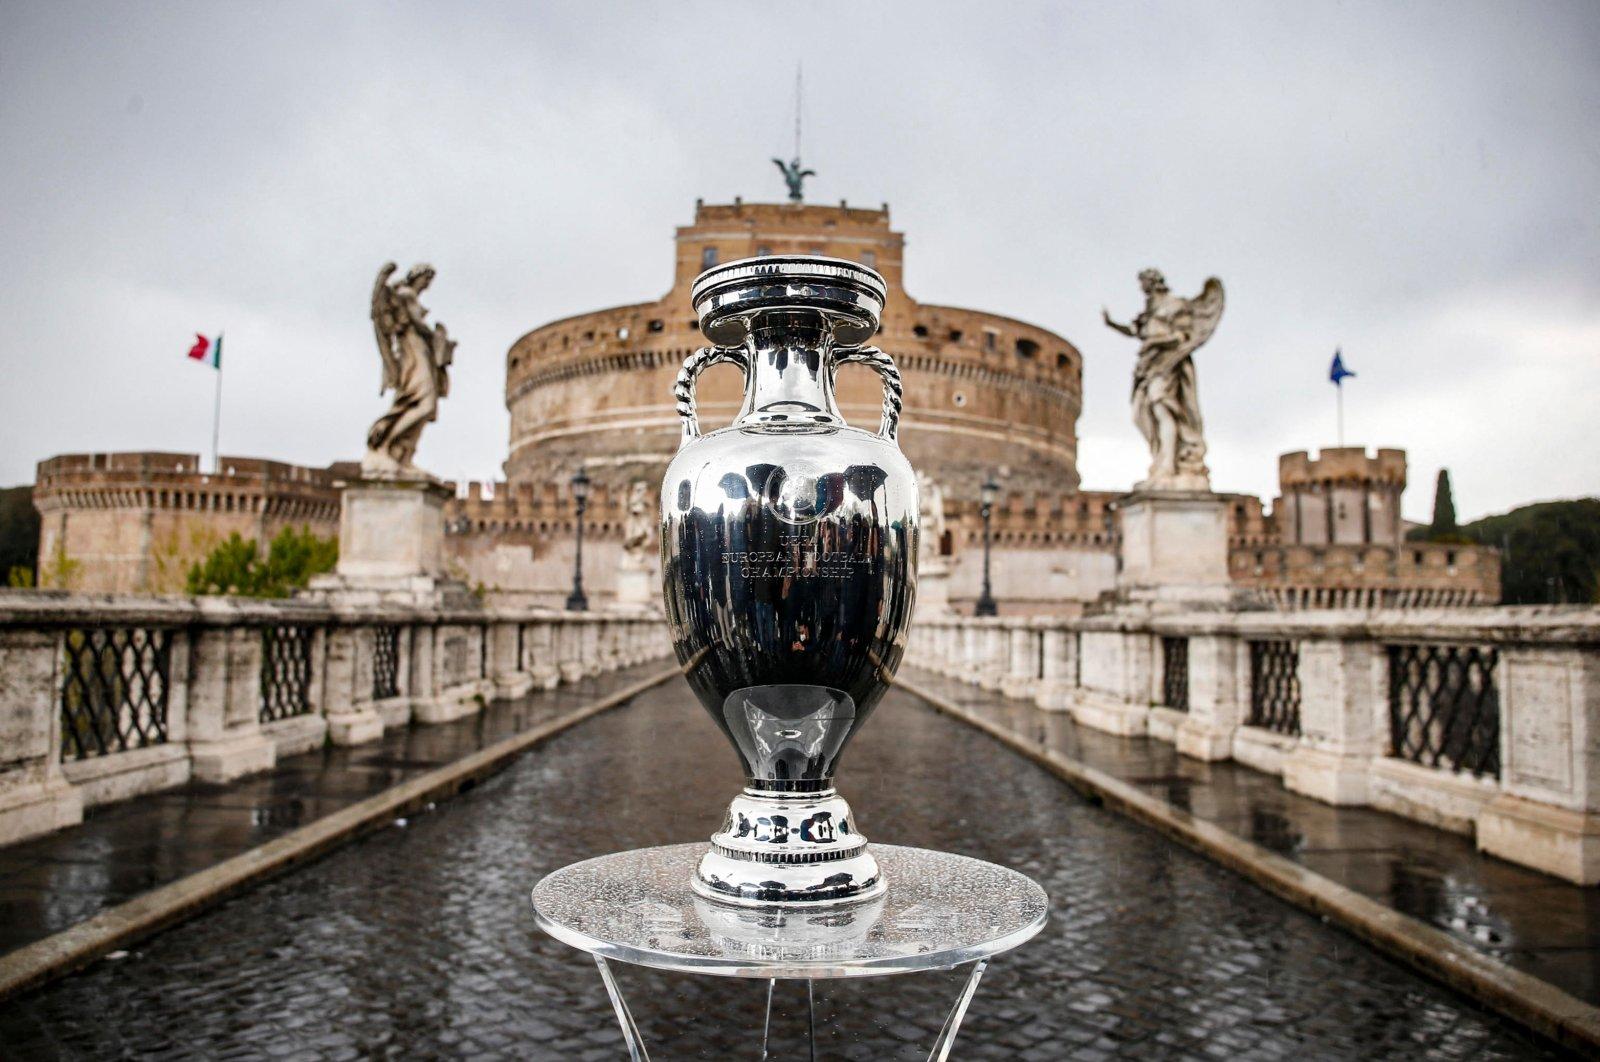 The UEFA Euro 2020 trophy on Sant'Angelo bridge, Rome, Italy, April 20, 2021. (AFP Photo)